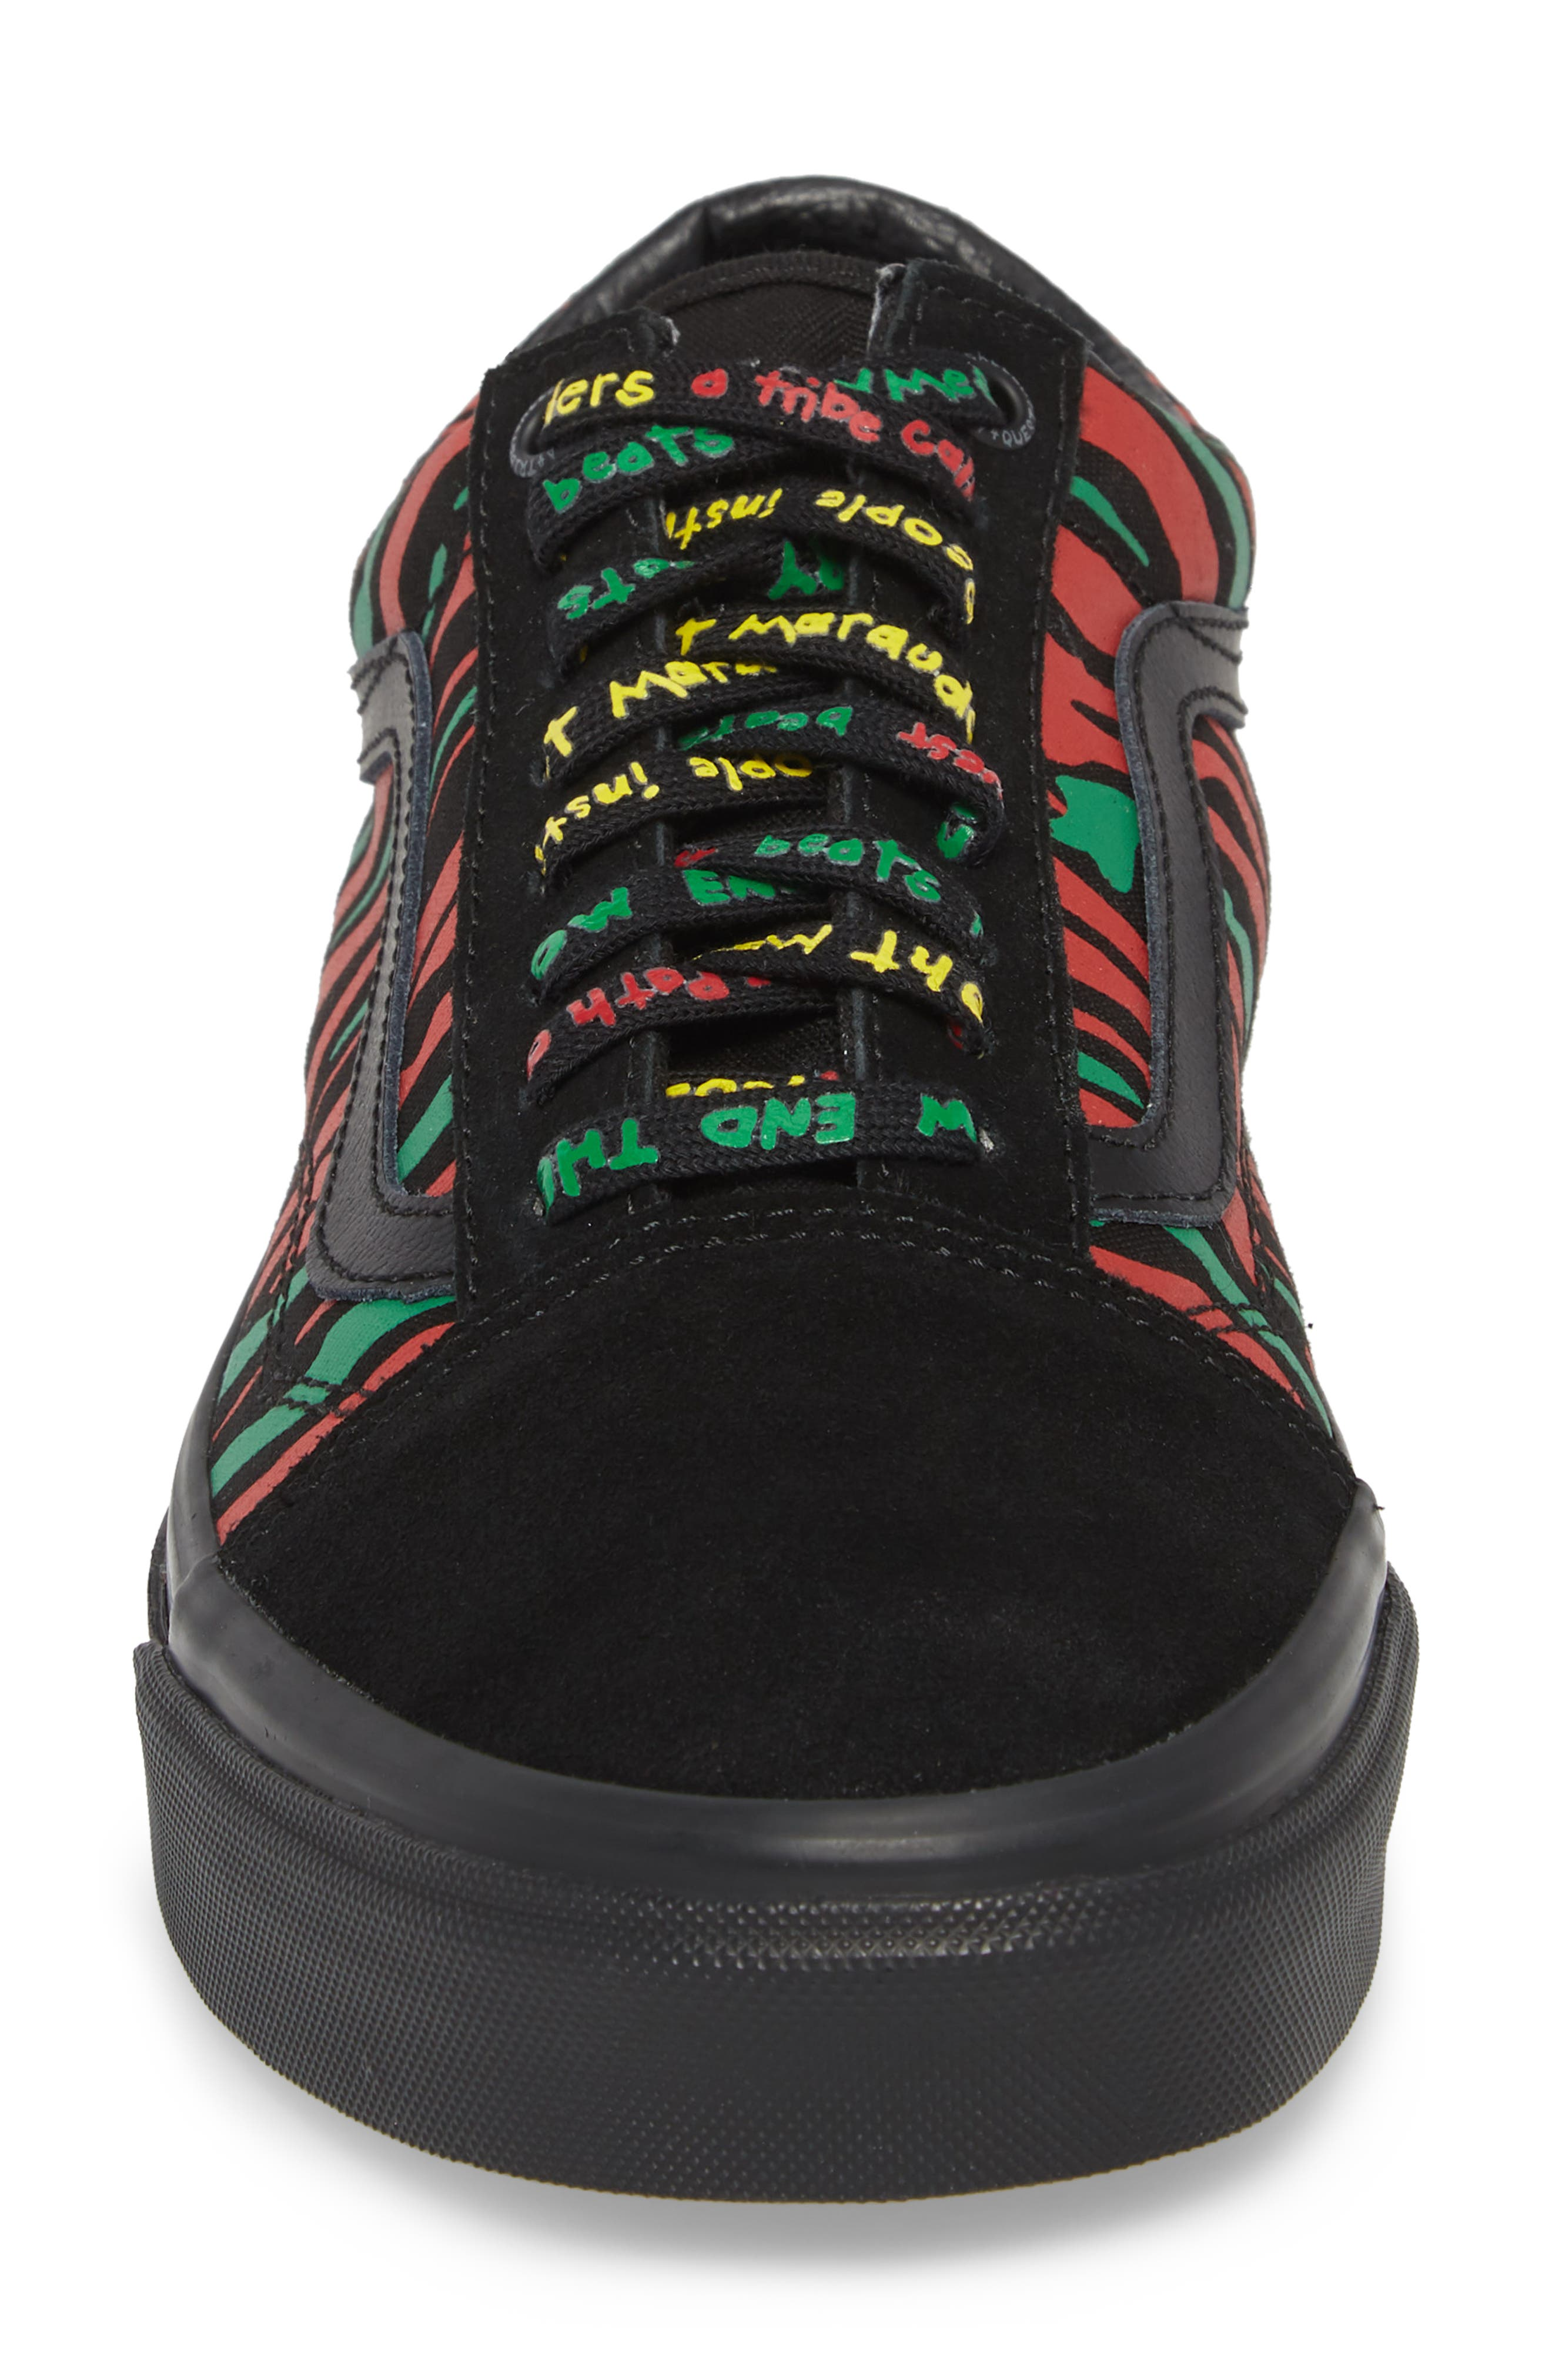 ATCQ Old Skool Sneaker,                             Alternate thumbnail 4, color,                             Black Leather